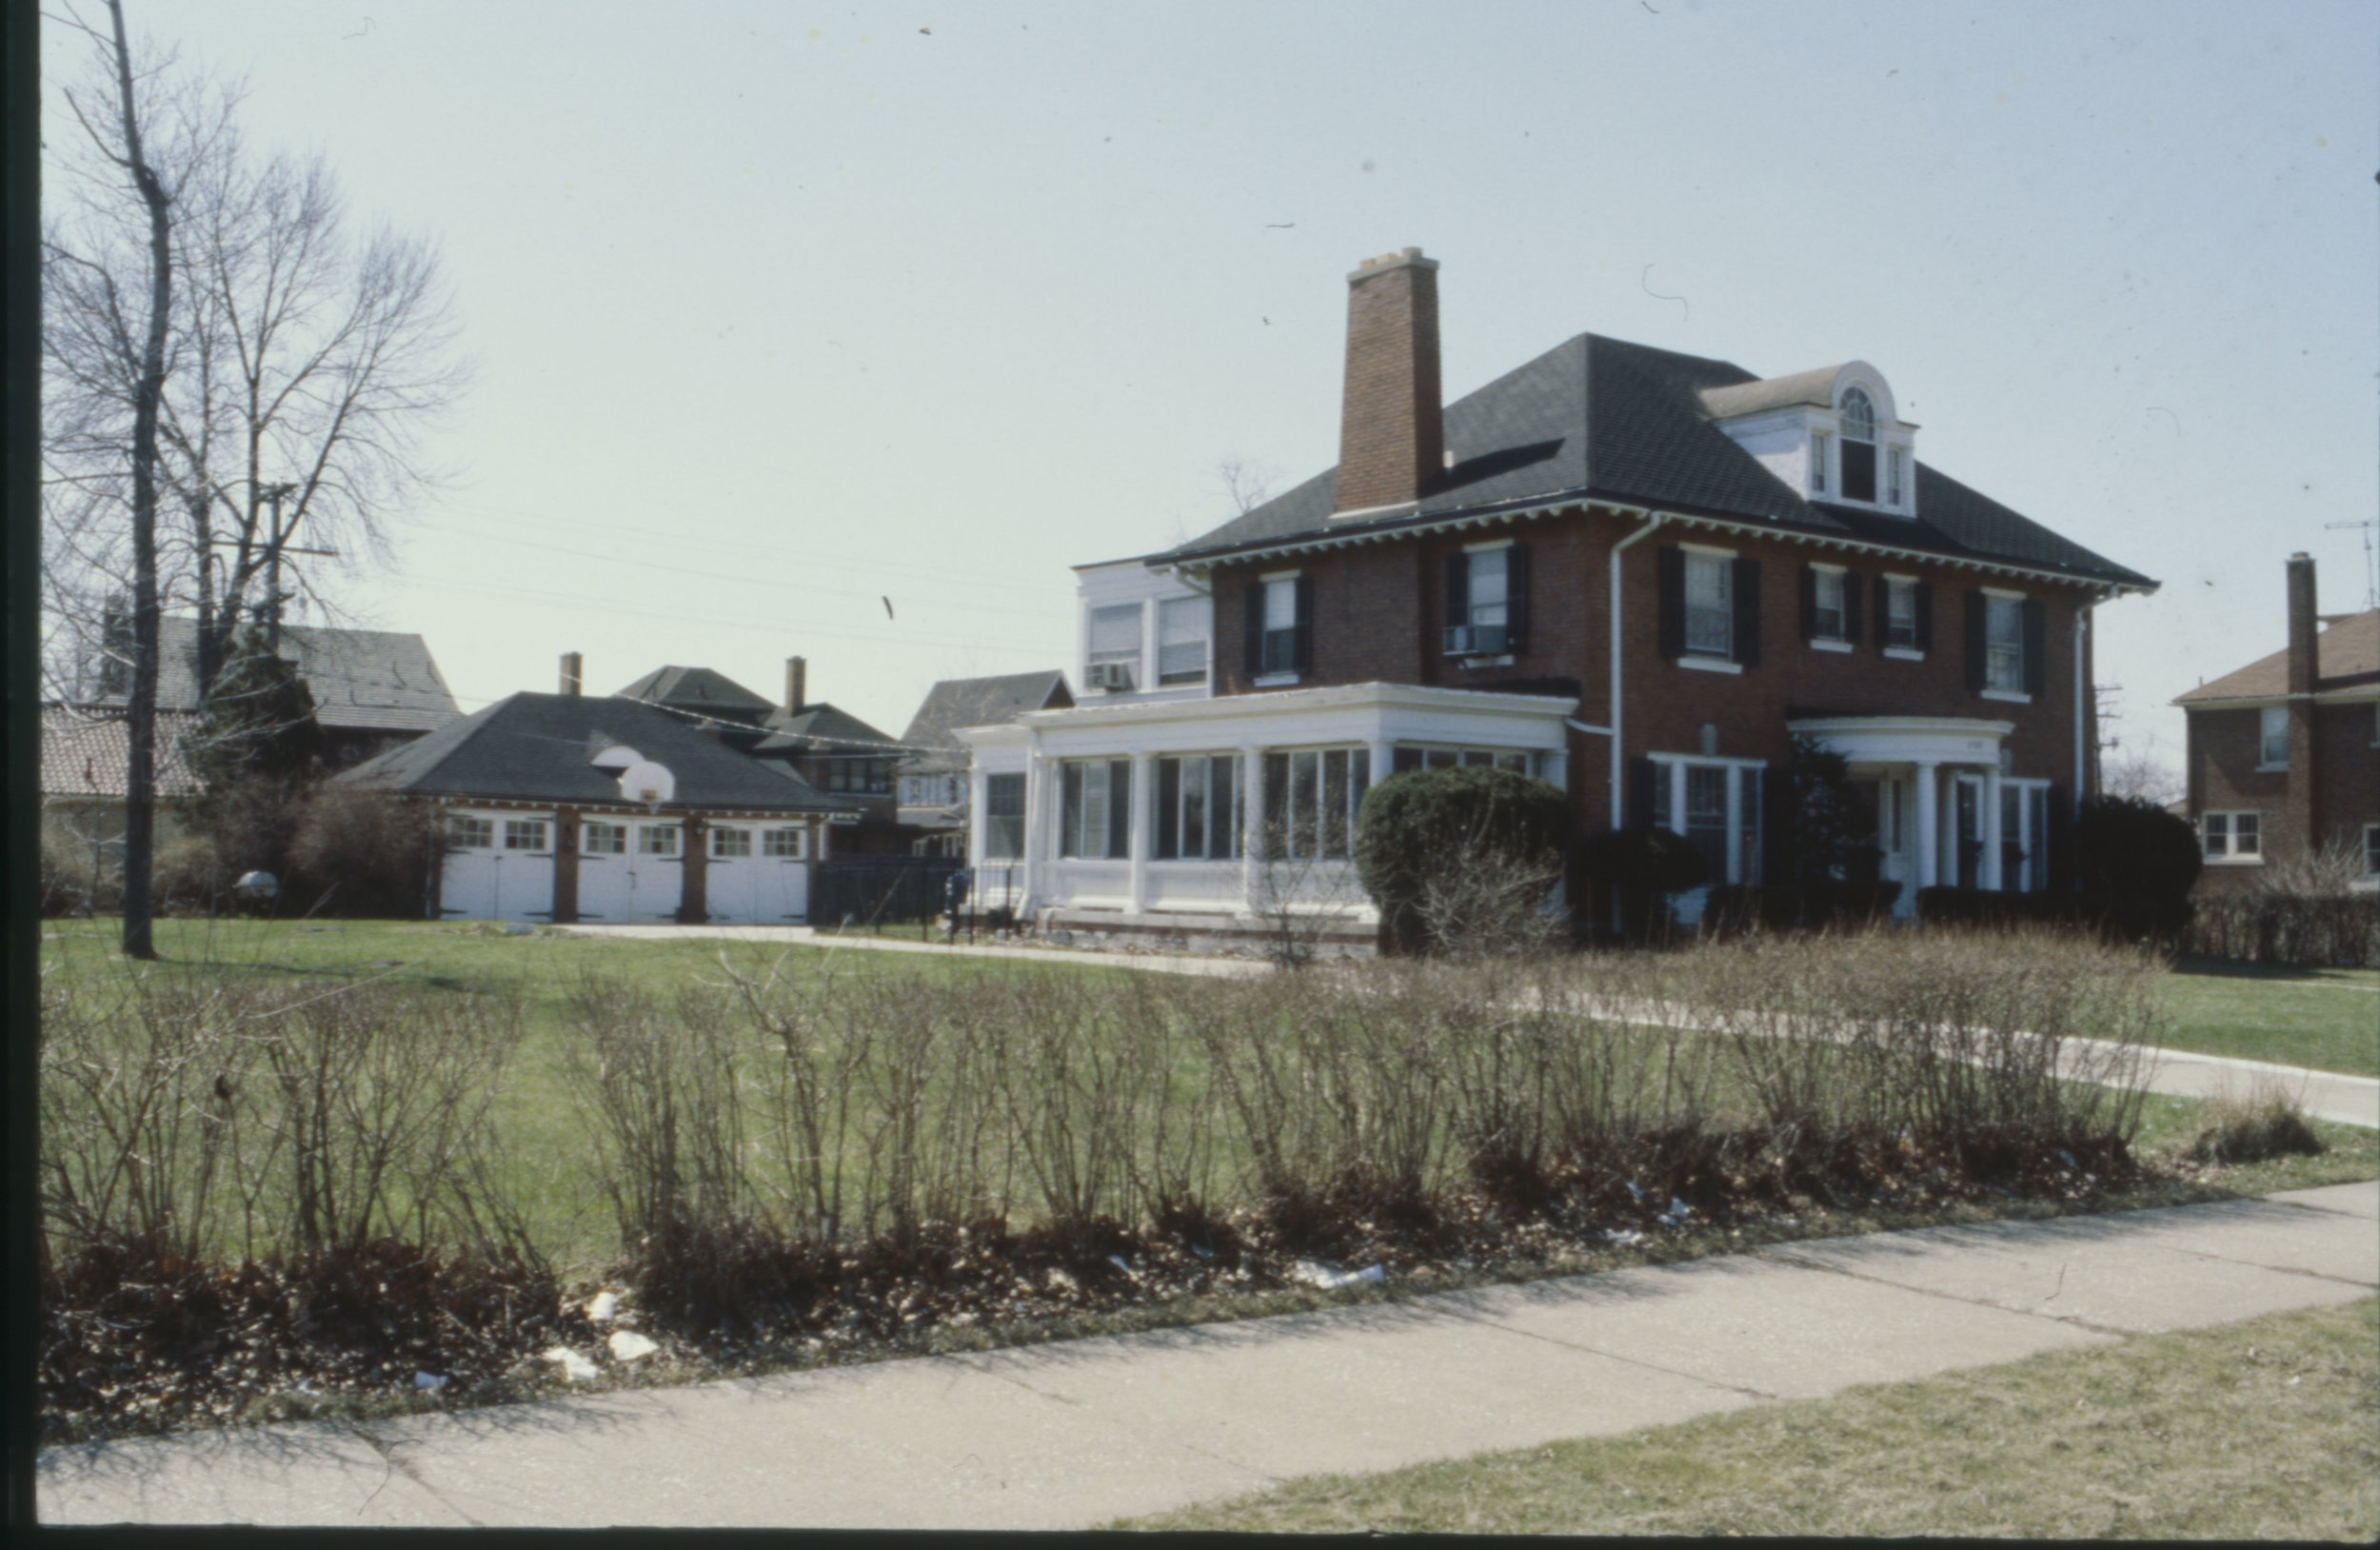 1115 W. Boston 1980_2.jpg